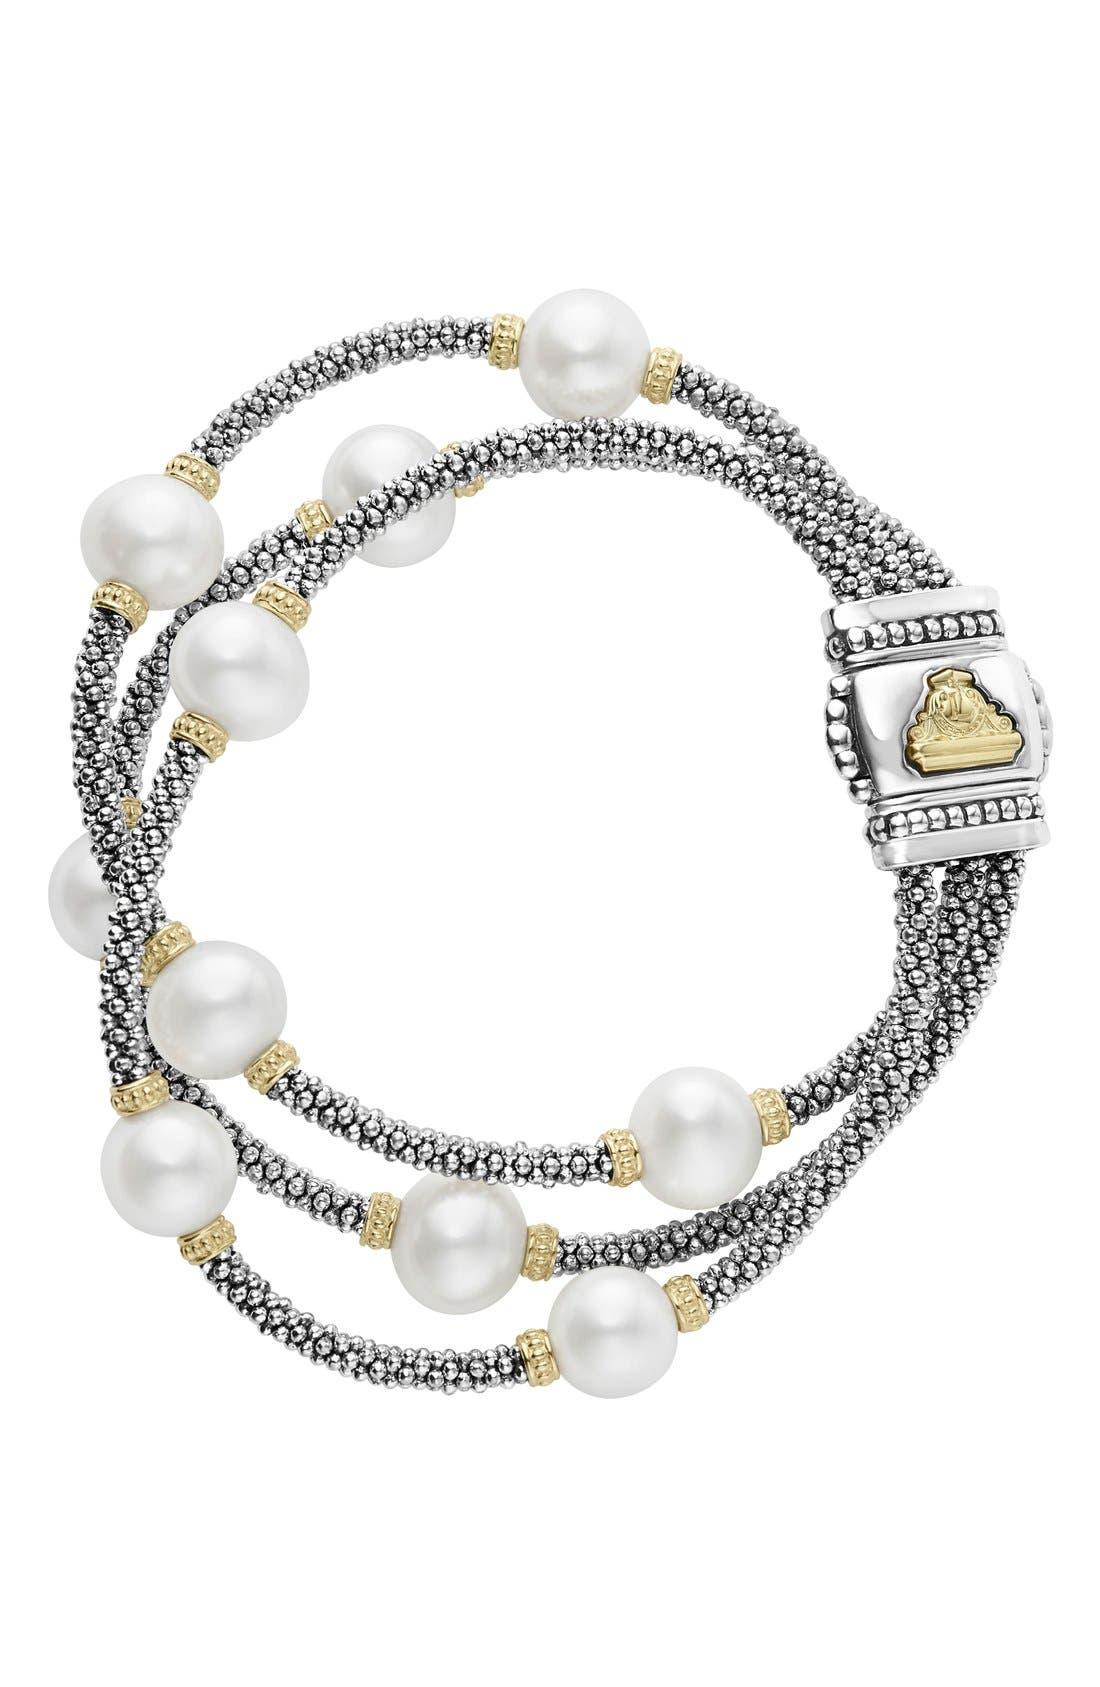 Luna Pearl Triple Strand Bracelet,                             Main thumbnail 1, color,                             040